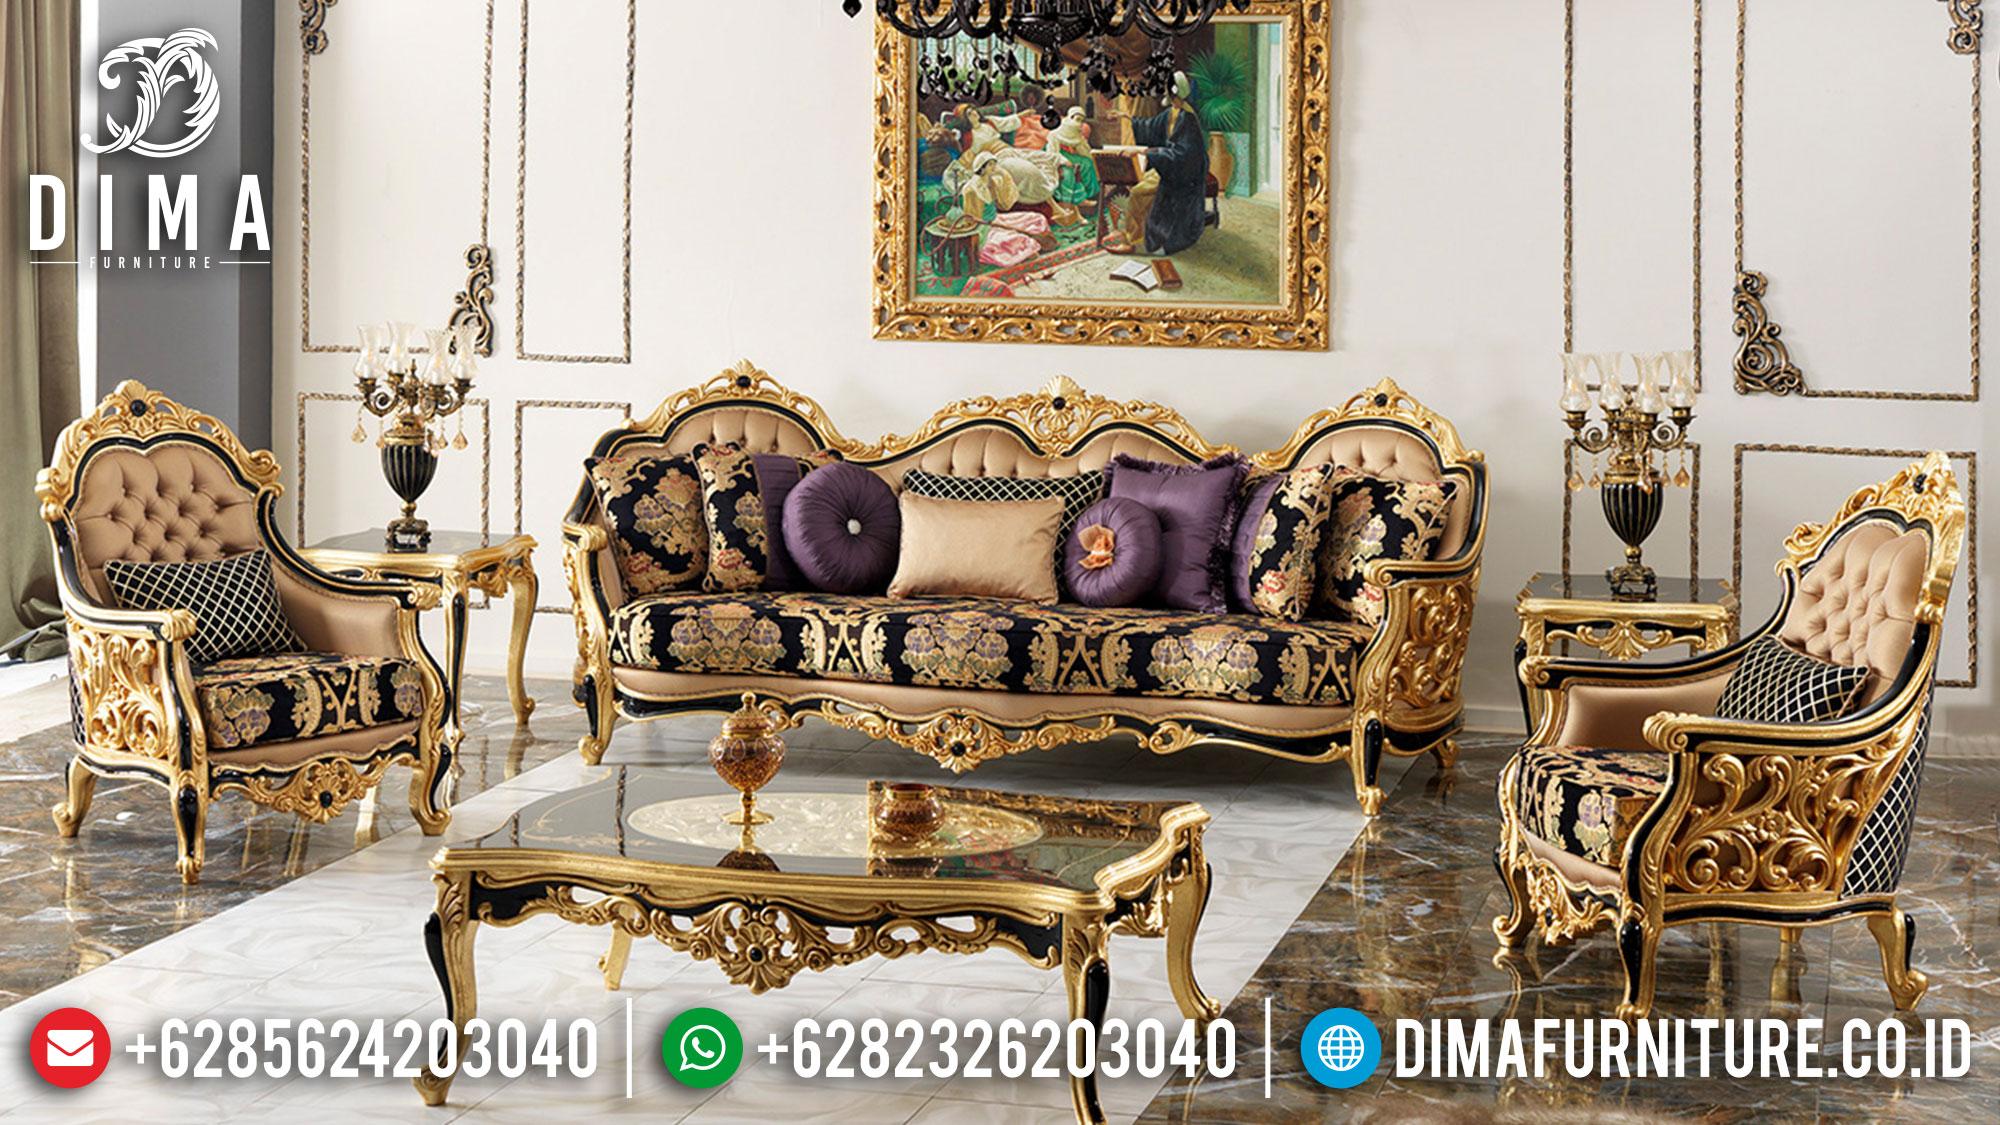 Maxwell Style Sofa Tamu Jepara Luxury Design Classic High Quality TTJ-1495